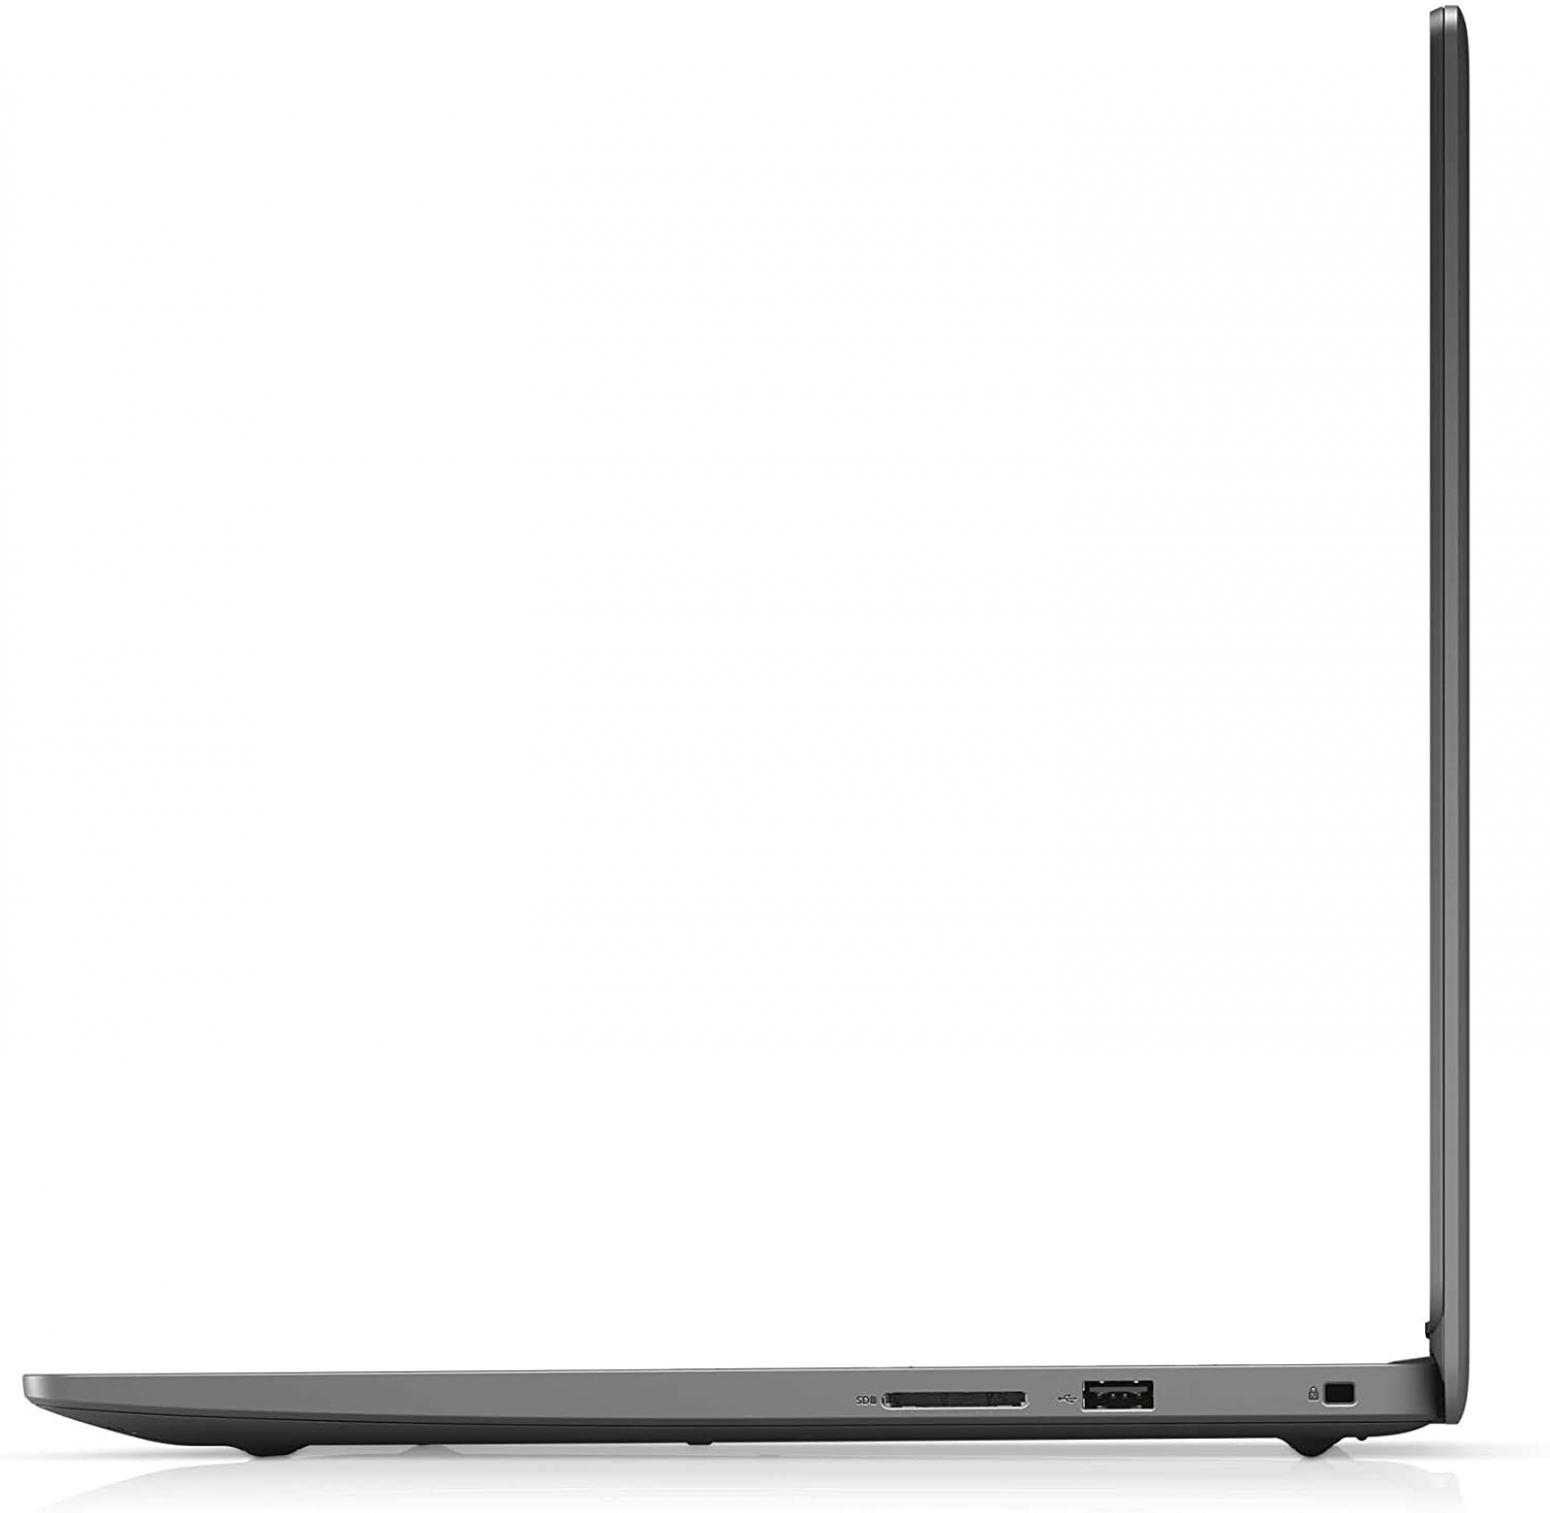 Ordinateur portable Dell Inspiron 15 3501 Noir - i3, Intel G4, SSD 256 Go - photo 6